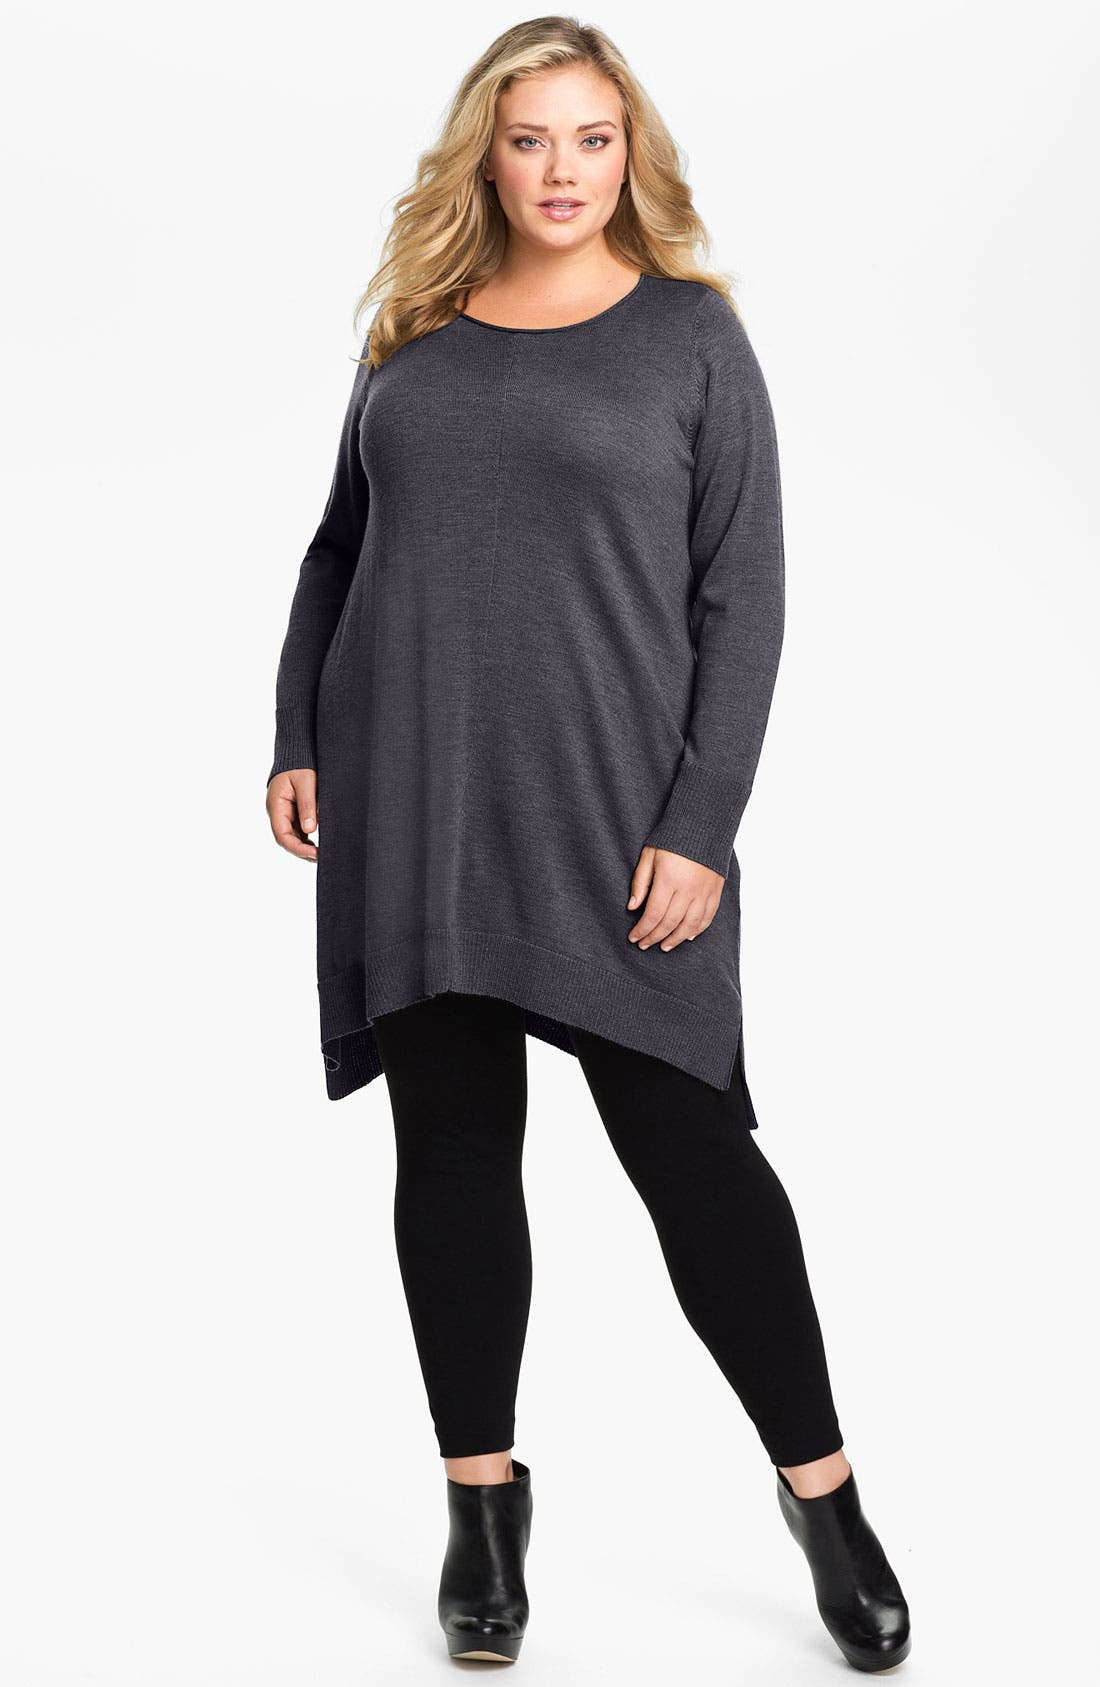 Alternate Image 1 Selected - Eileen Fisher Merino Wool Layering Dress (Plus Size)